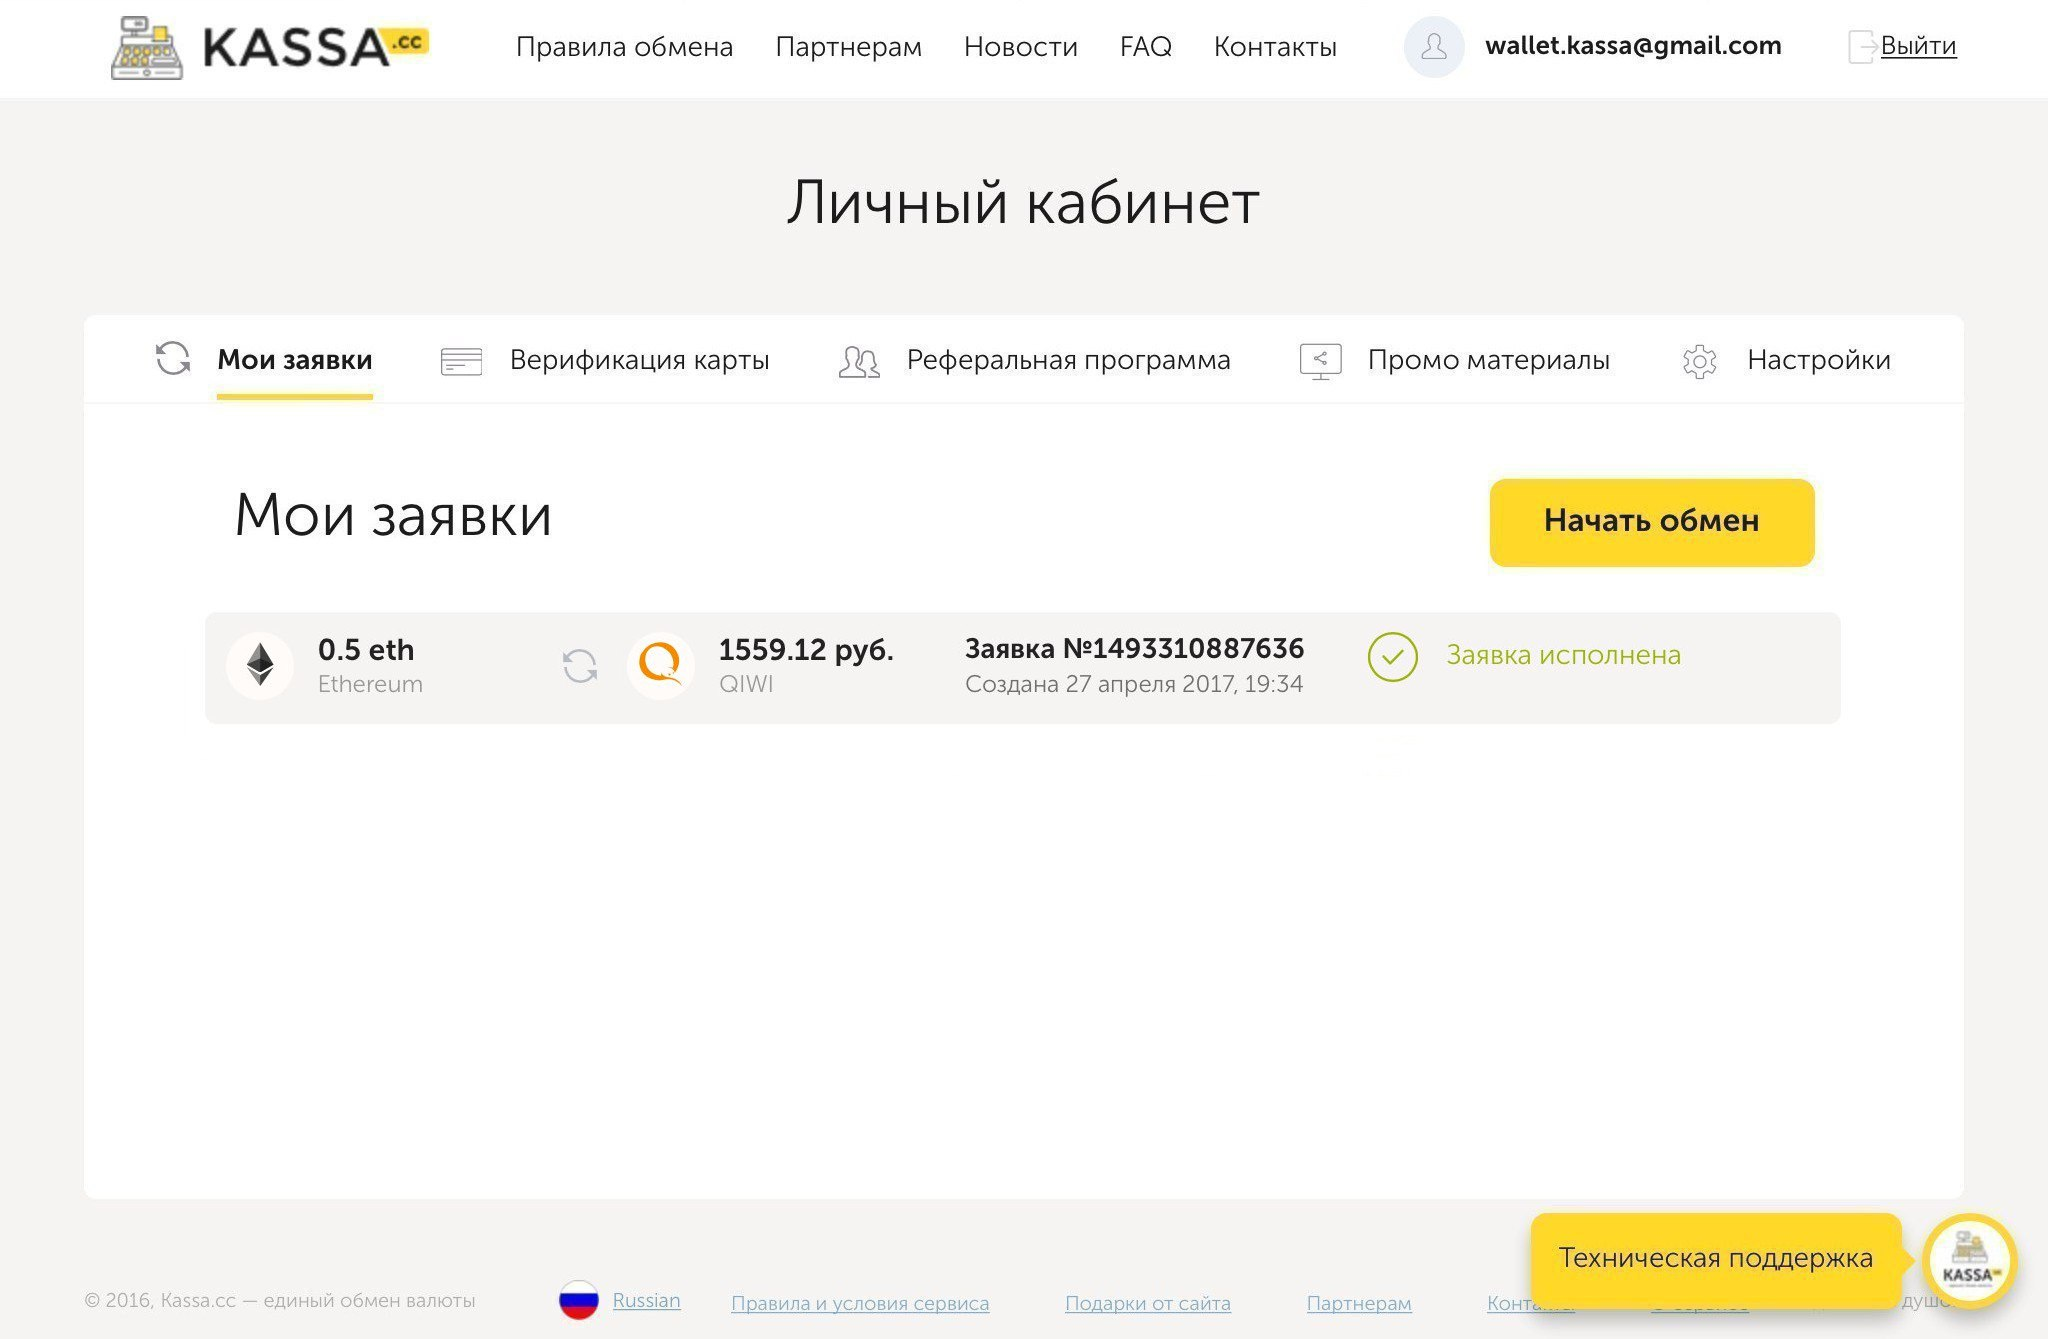 KKassa.cc is a single currency exchange. Exchange Ethereum for QIWI RUB